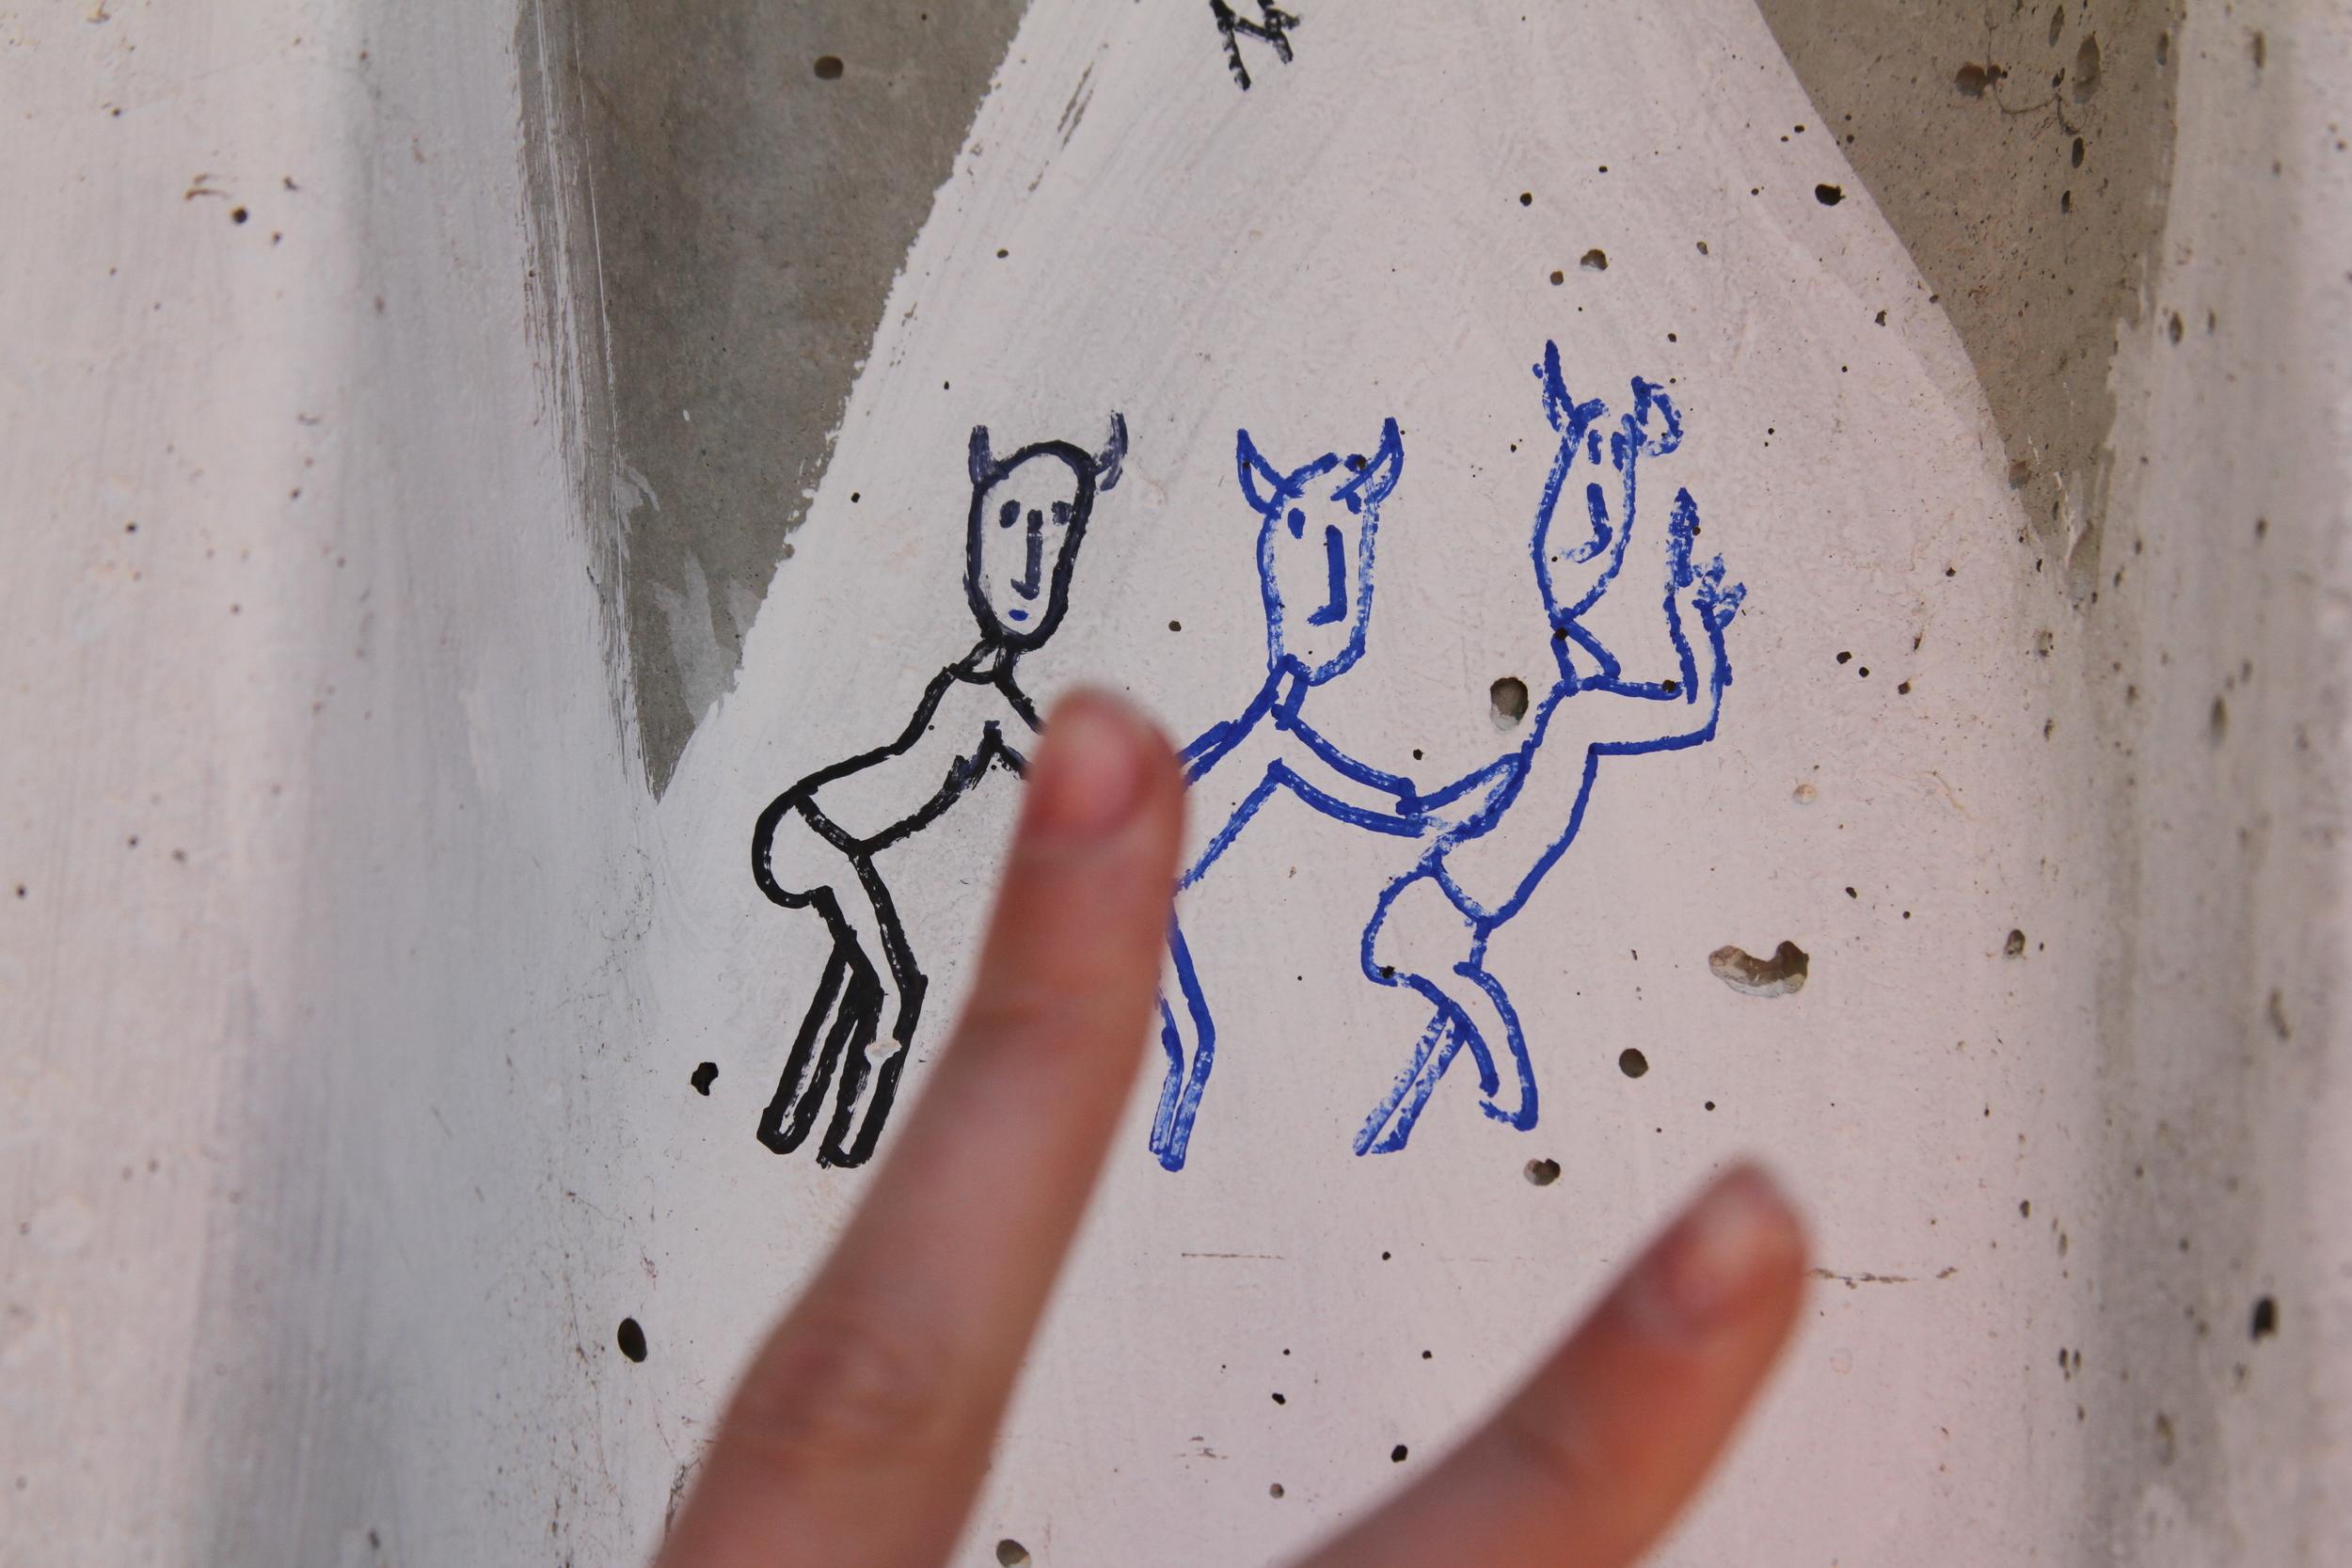 THE ONE PIECE OF STREET ART WE DONATED TO VALPARAÍSO: NICOLAI'S TWERKING DEVILS